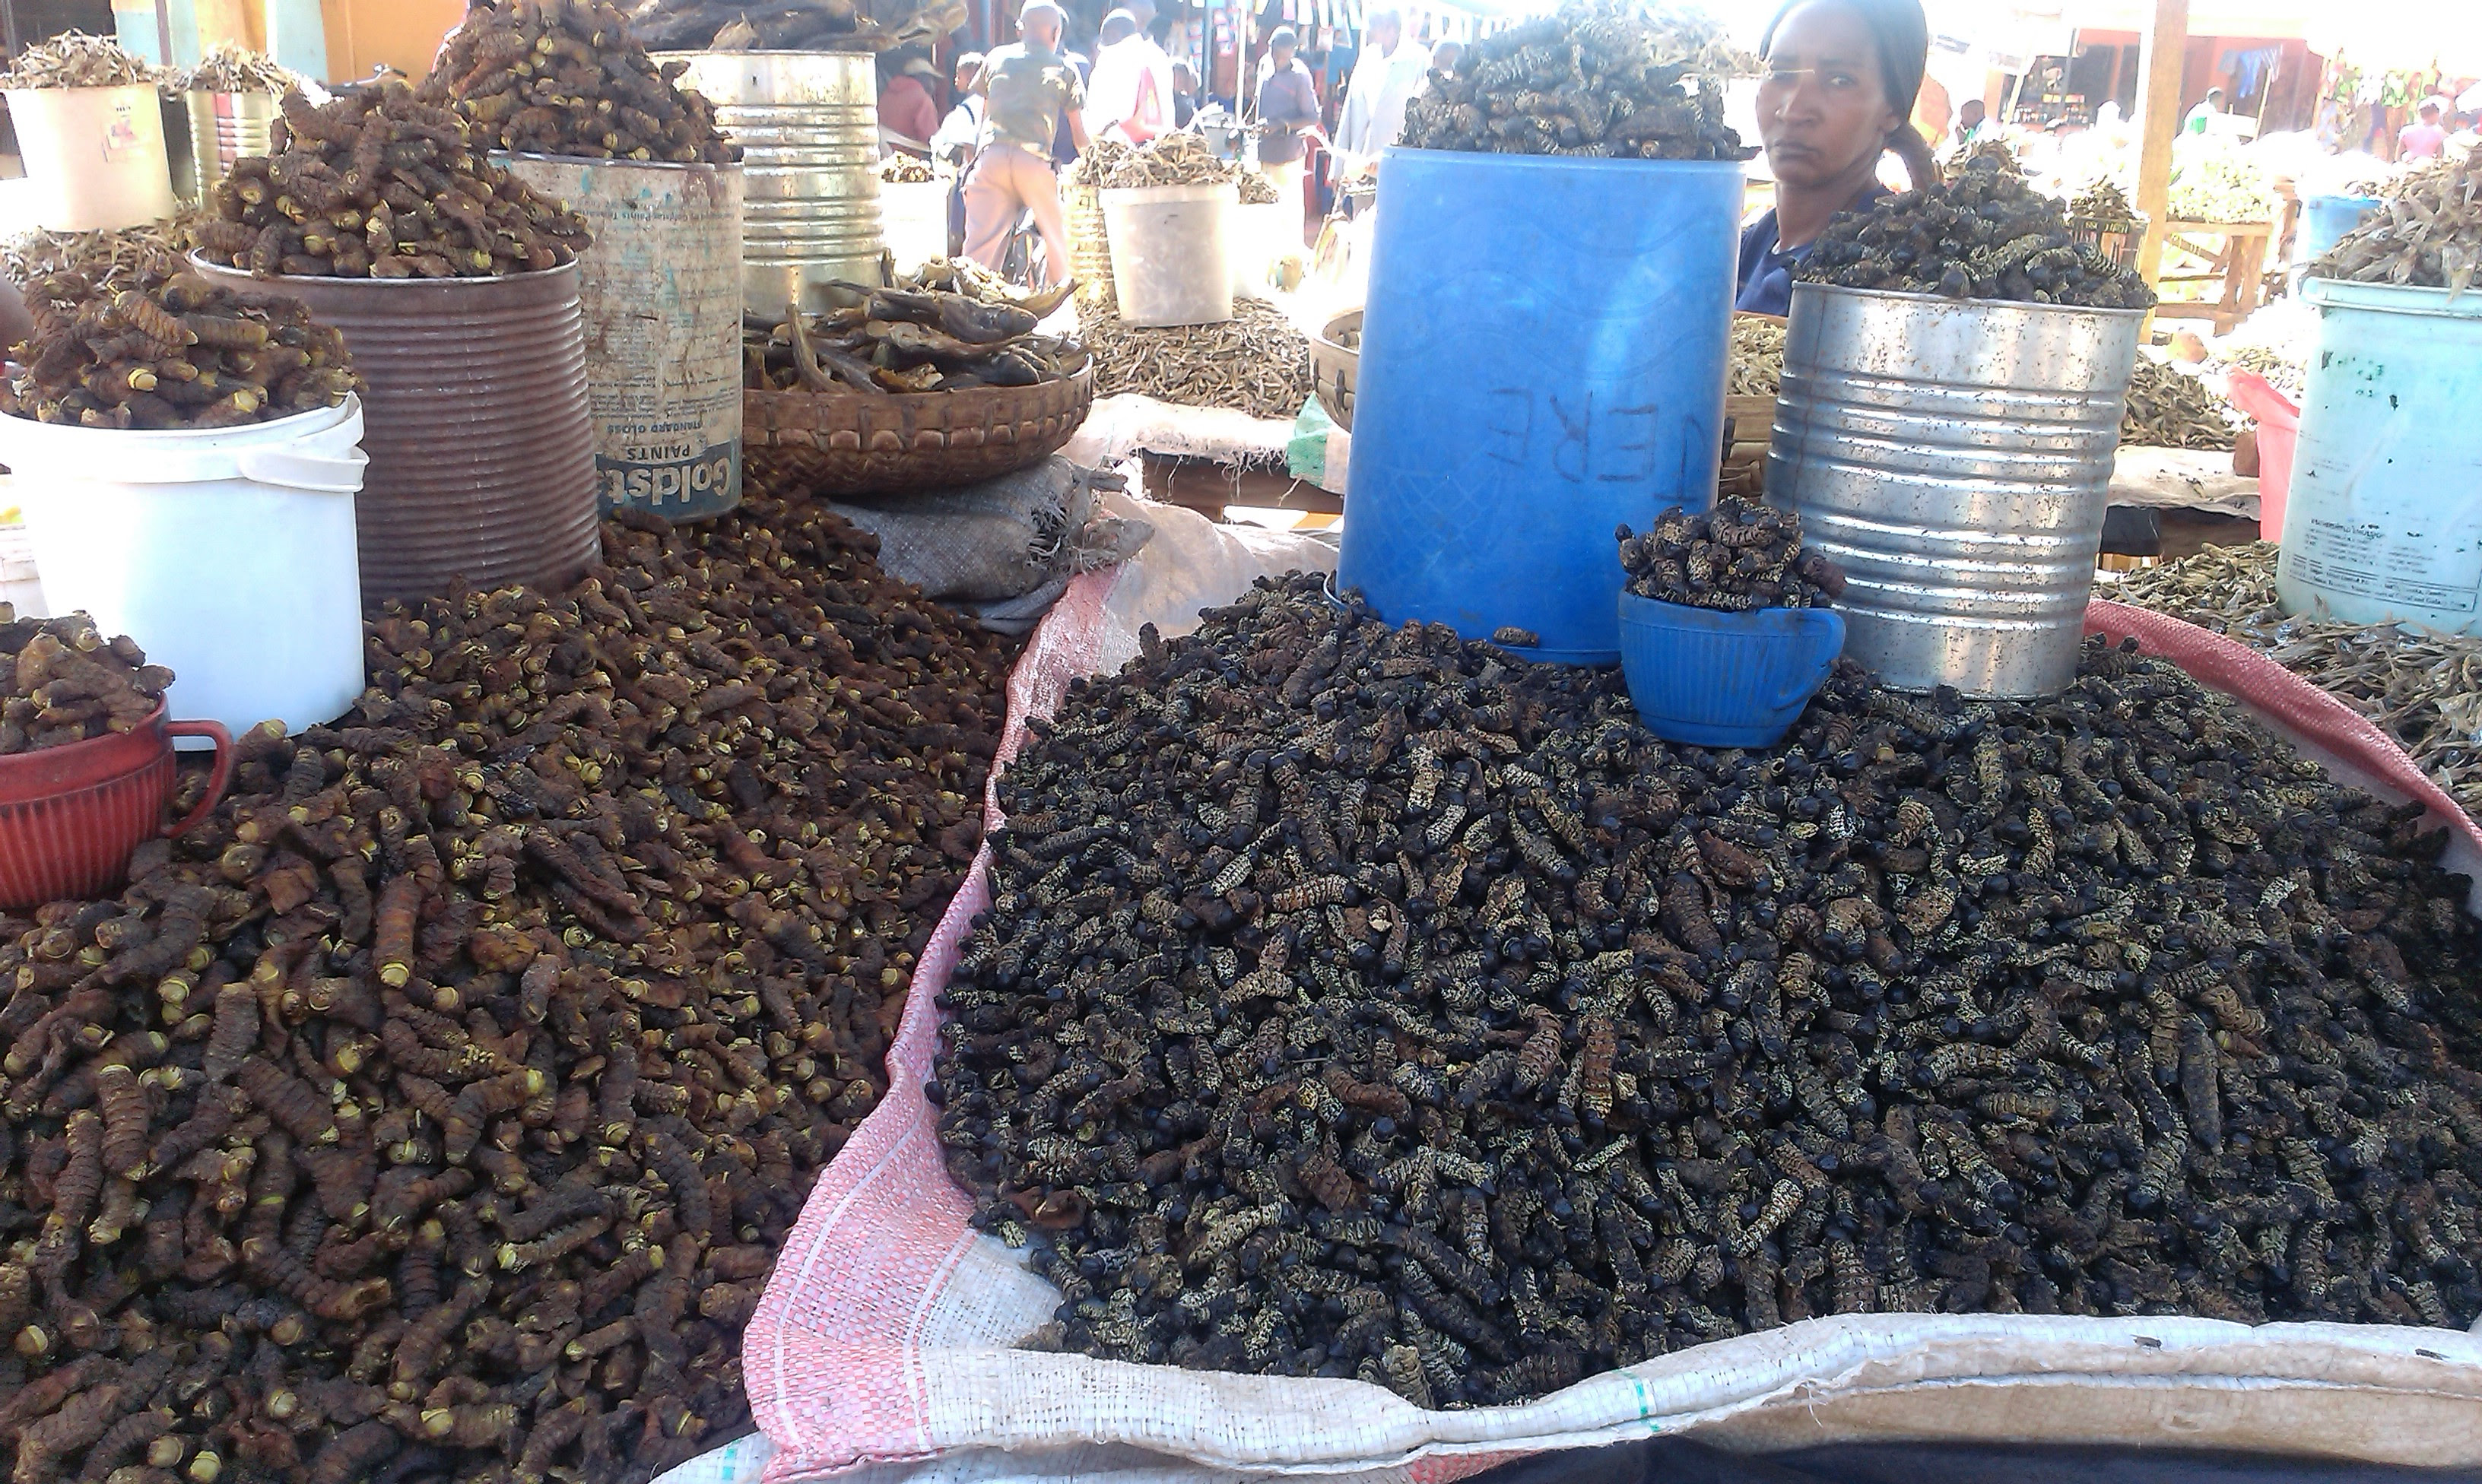 Mopani worms, A Zambian delicacy